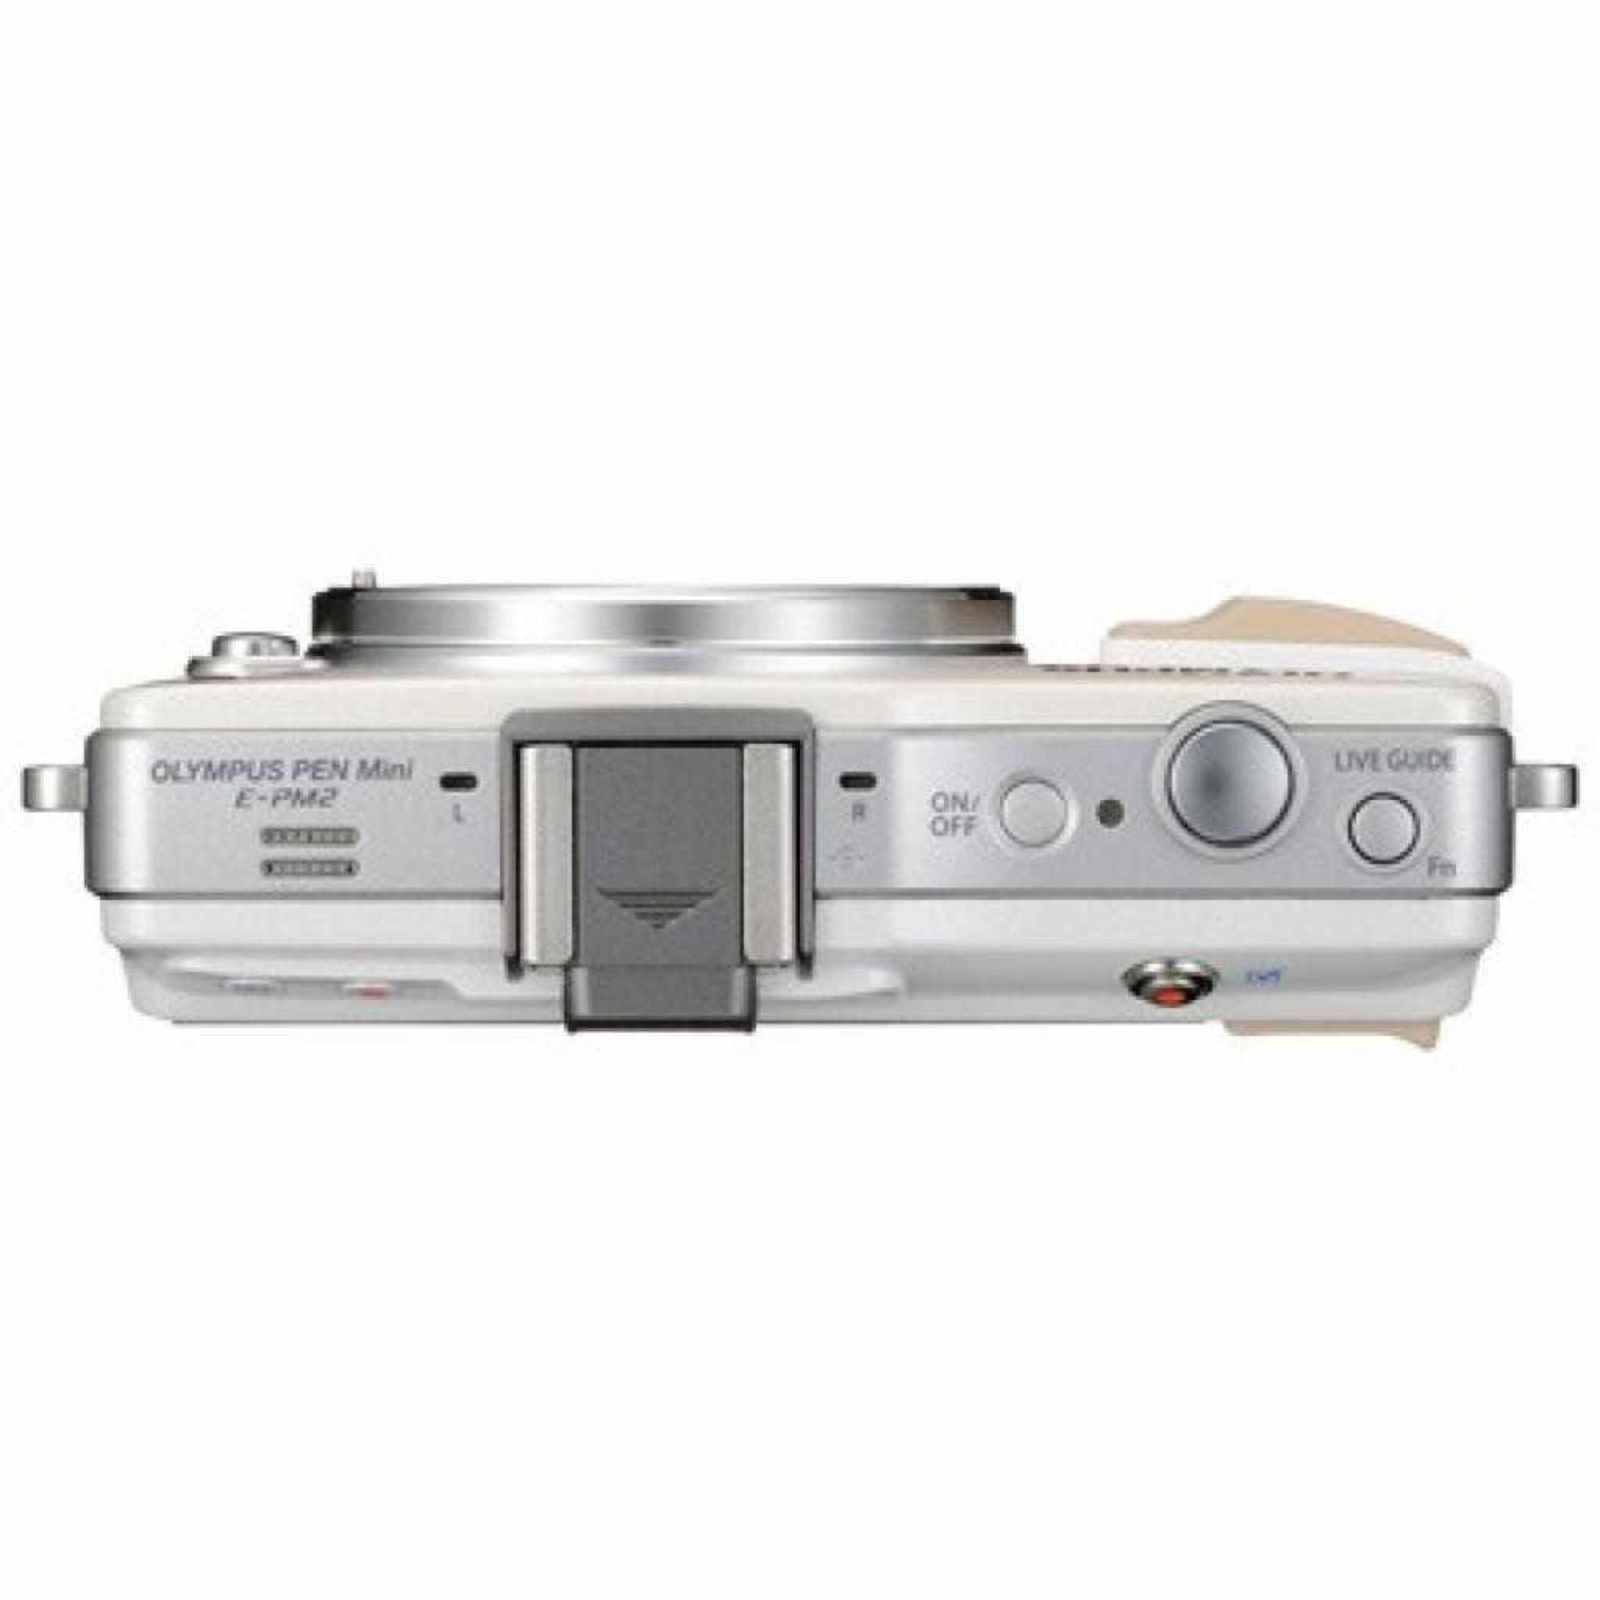 Цифровой фотоаппарат OLYMPUS PEN E-PM2 14-42 mm kit Flash Air white/silver (V206021WE010) изображение 3